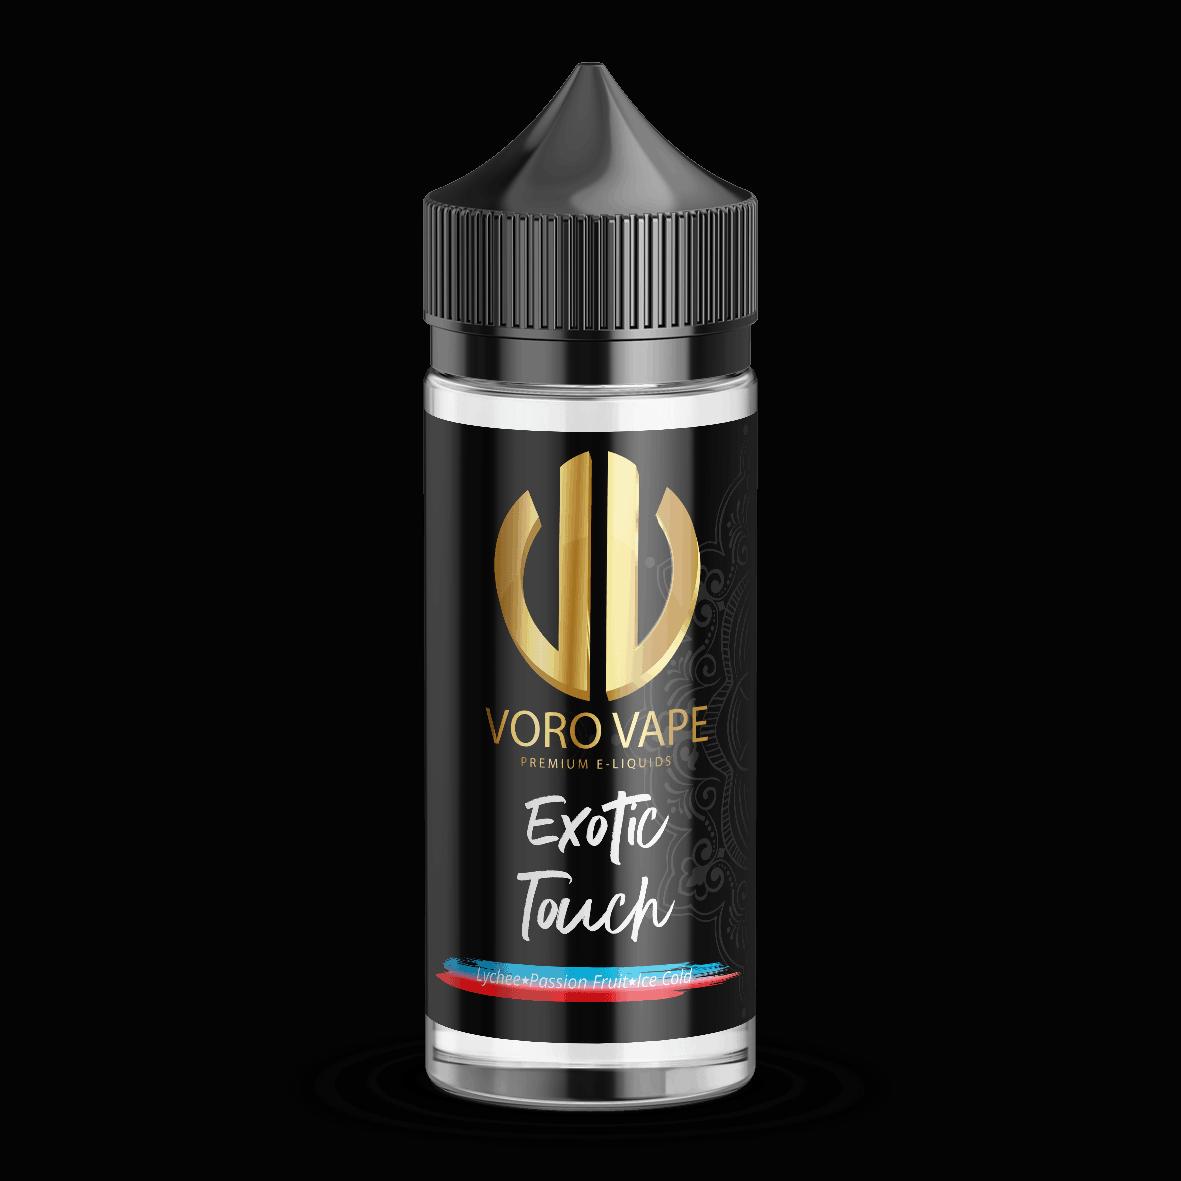 Exotic Touch E-Liquid Shortfill by Voro Vape